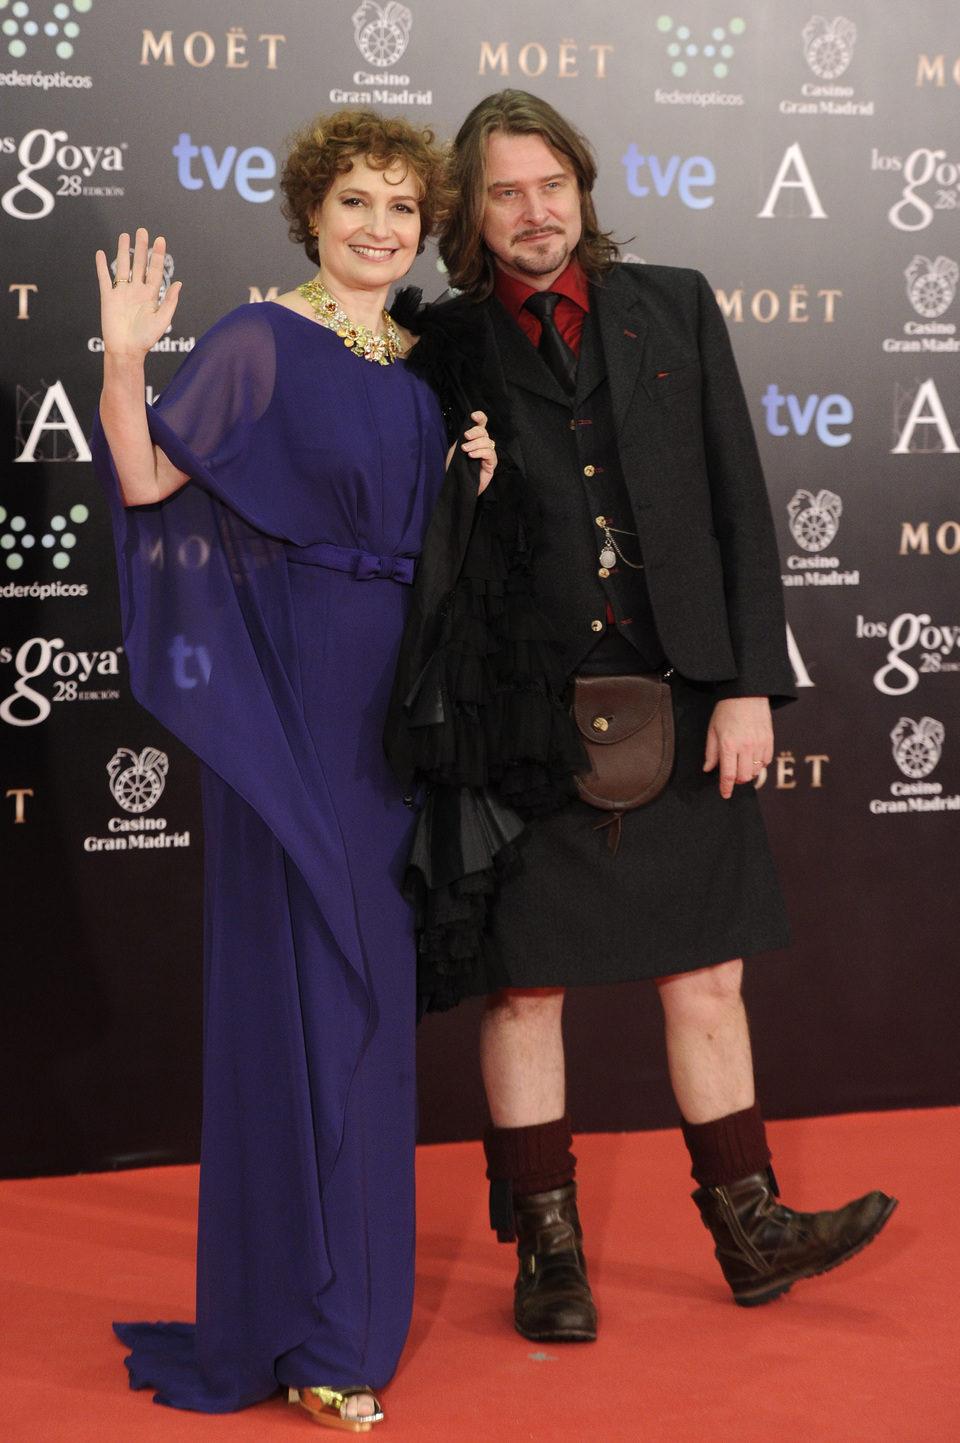 Scott Cleverdon y Assumpta Serna en los Goya 2014